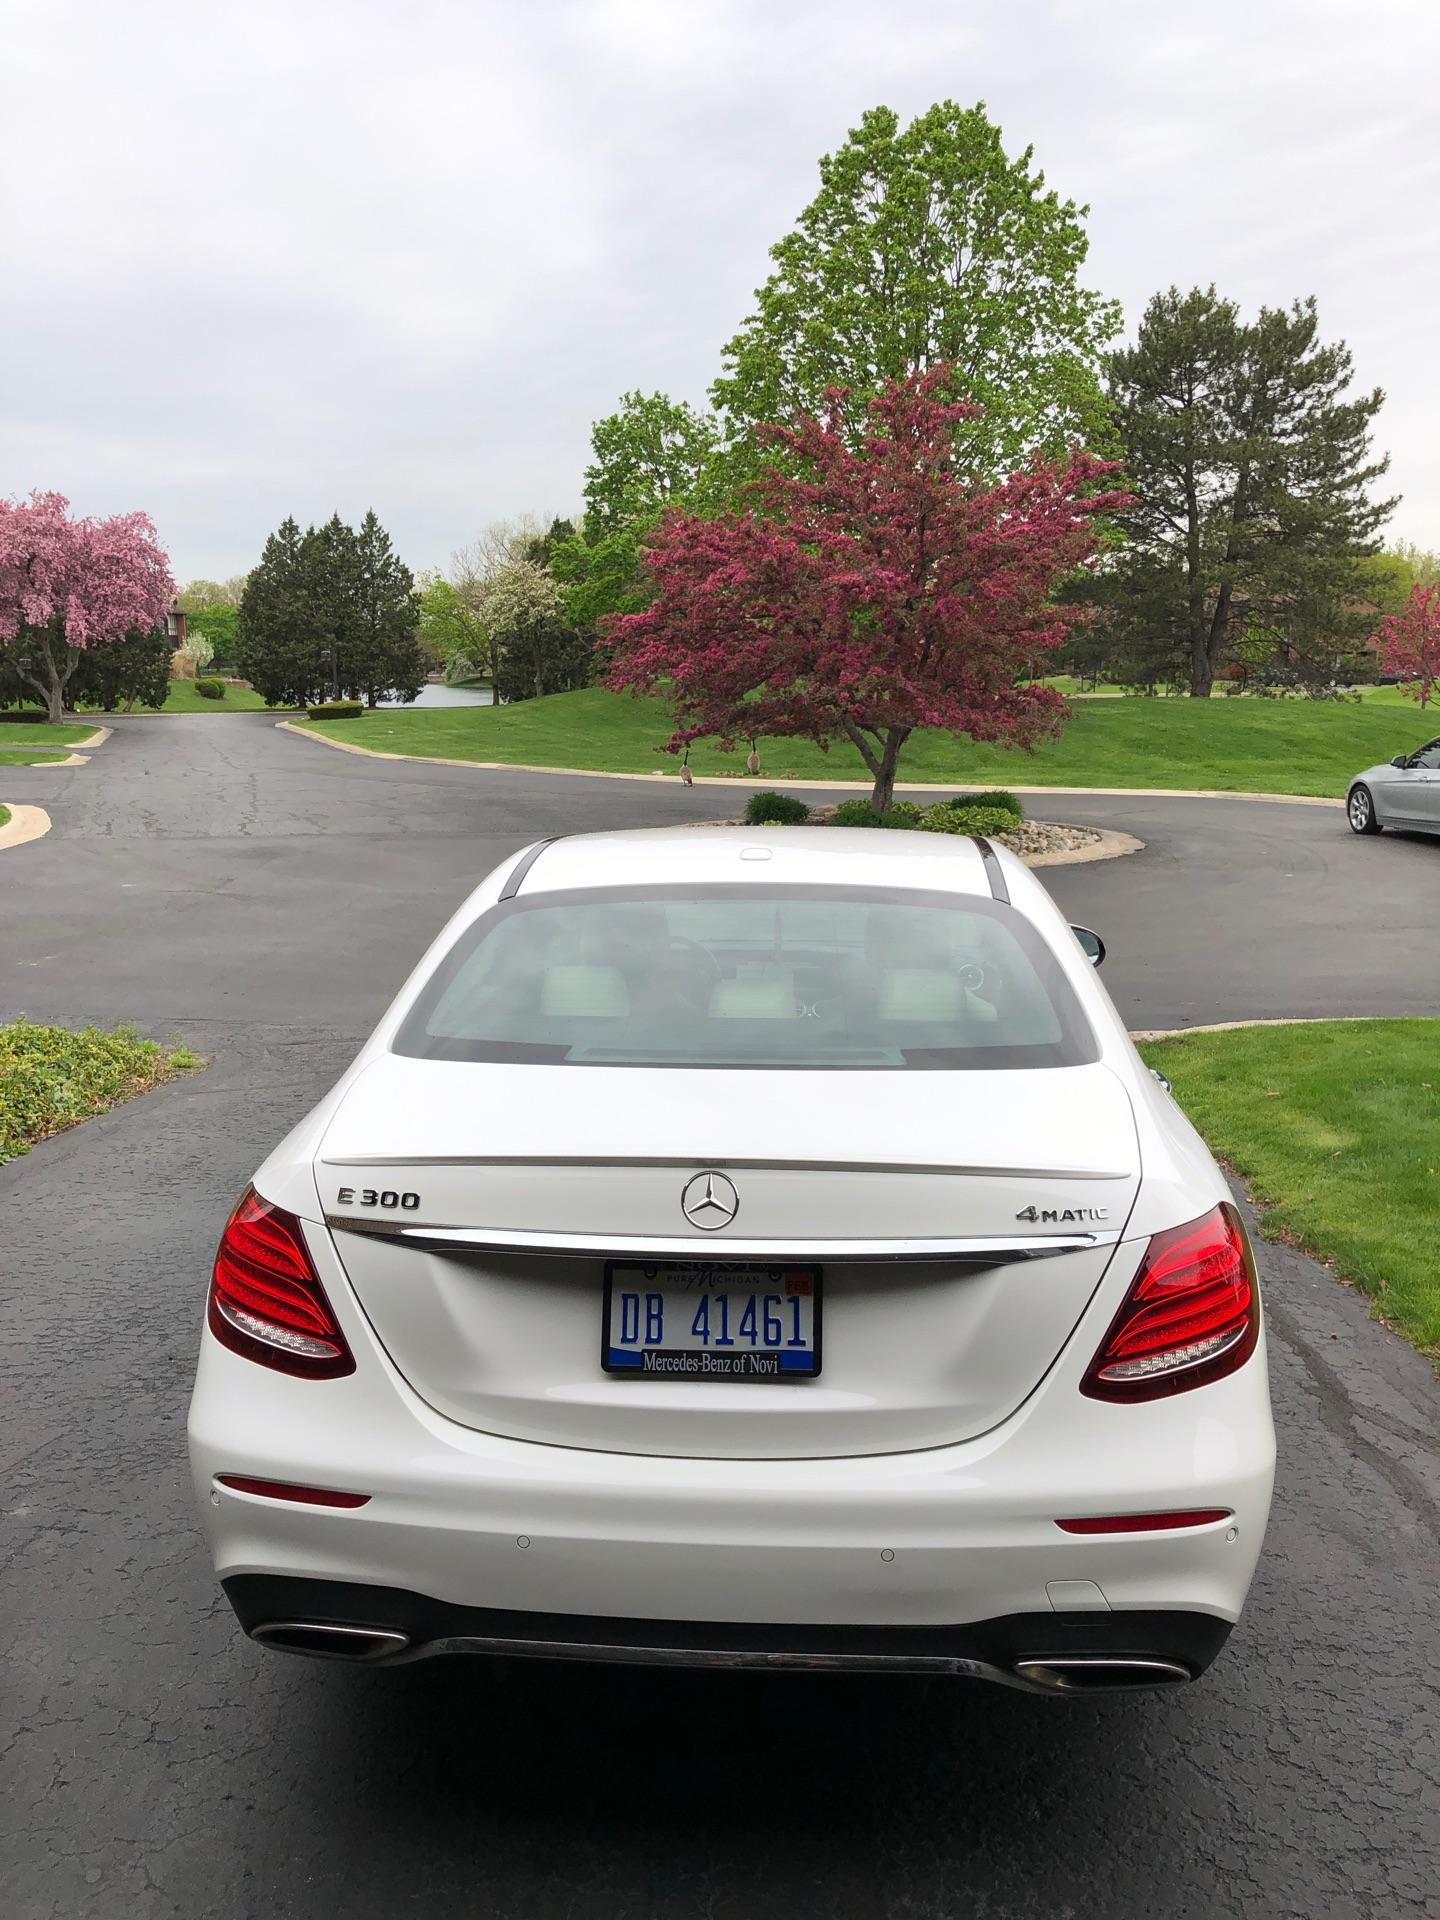 2017 Mercedes-Benz E-Class - photo 2